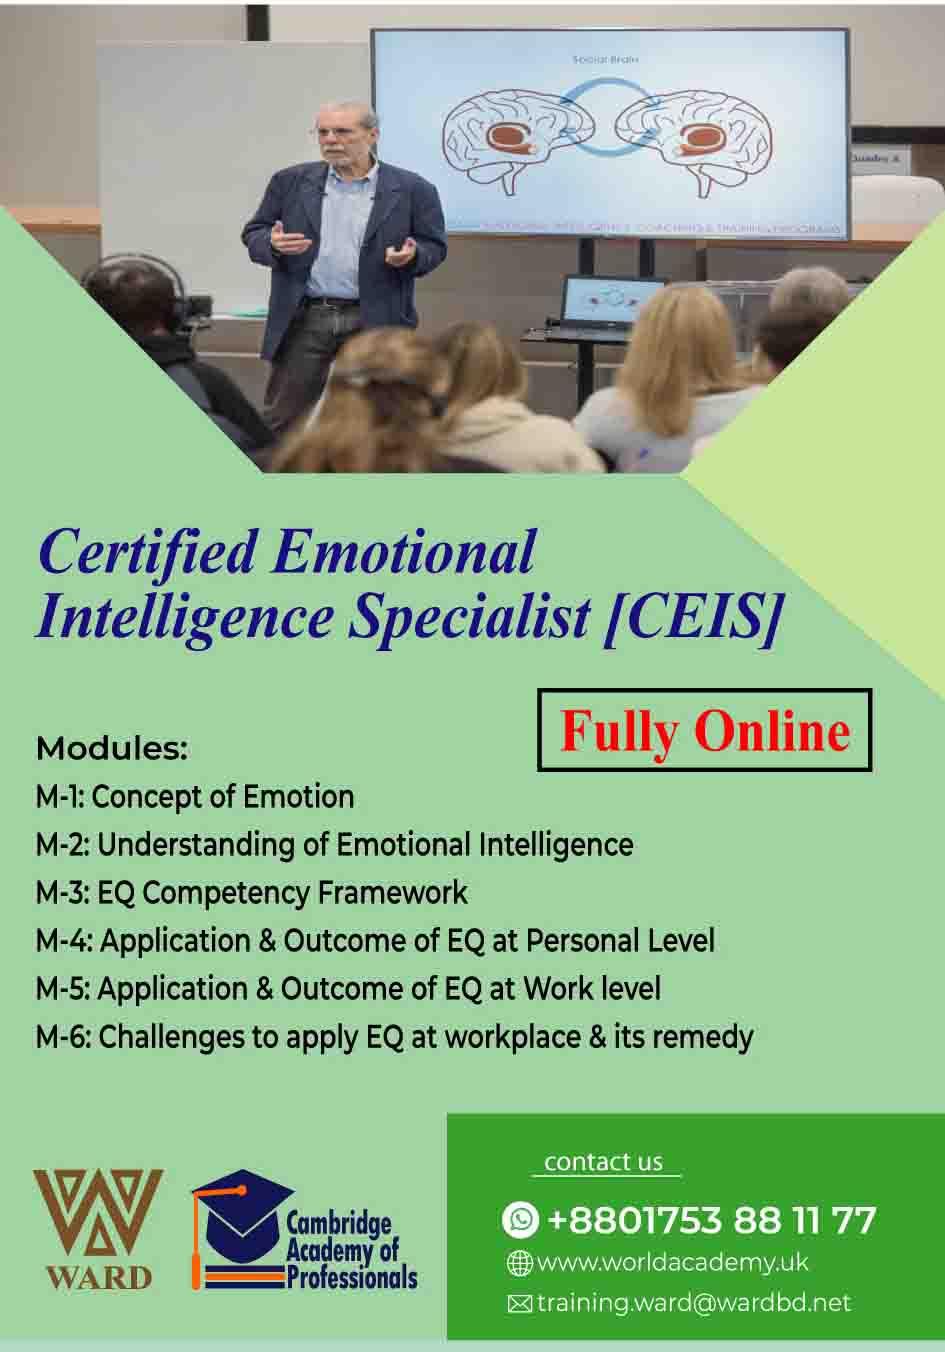 Certified Emotional Intelligence Specialist [CEIS]